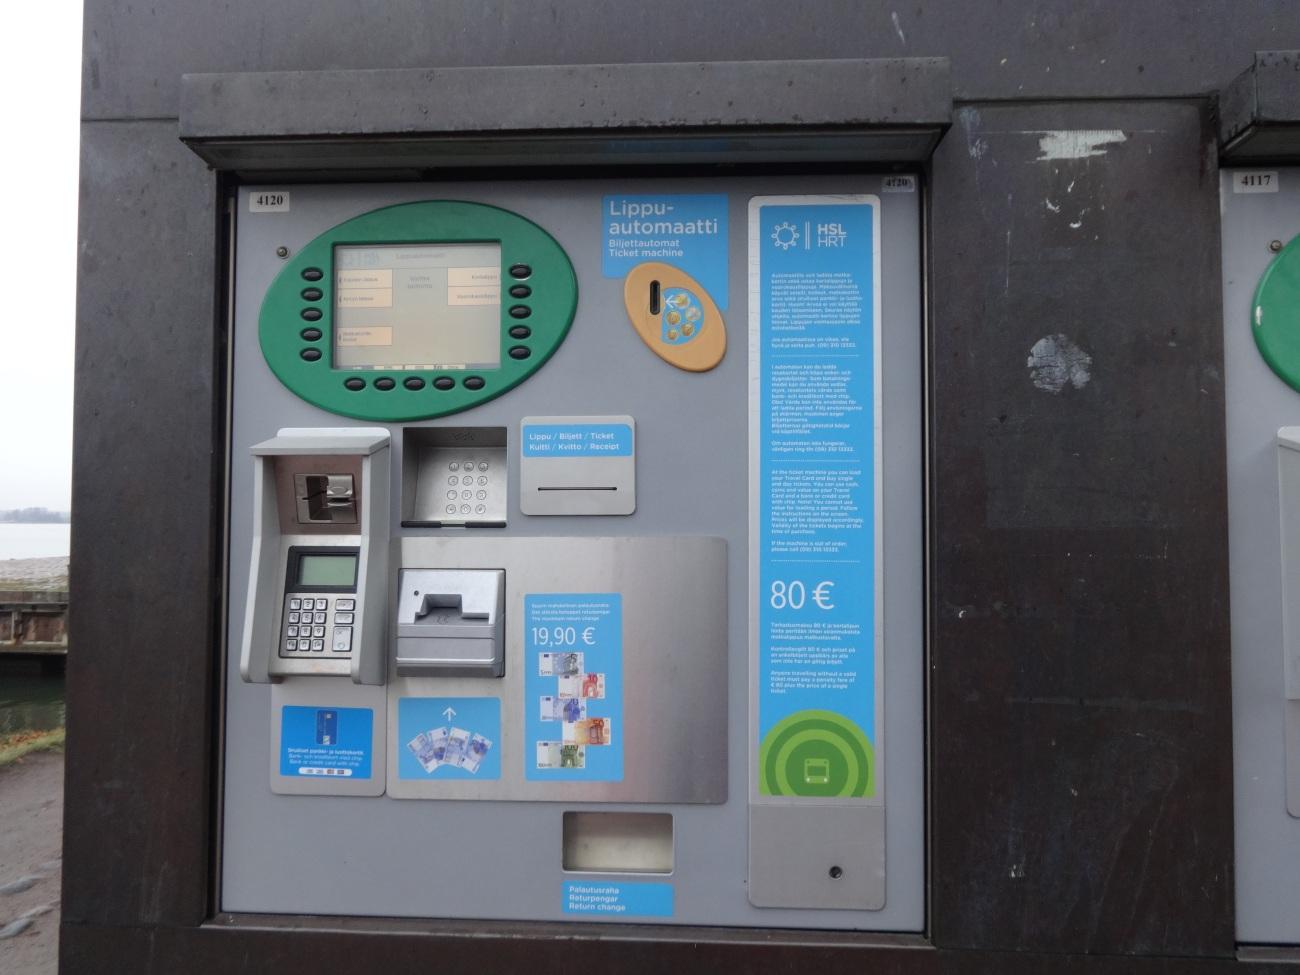 Ticket Vending Machine at Market Square